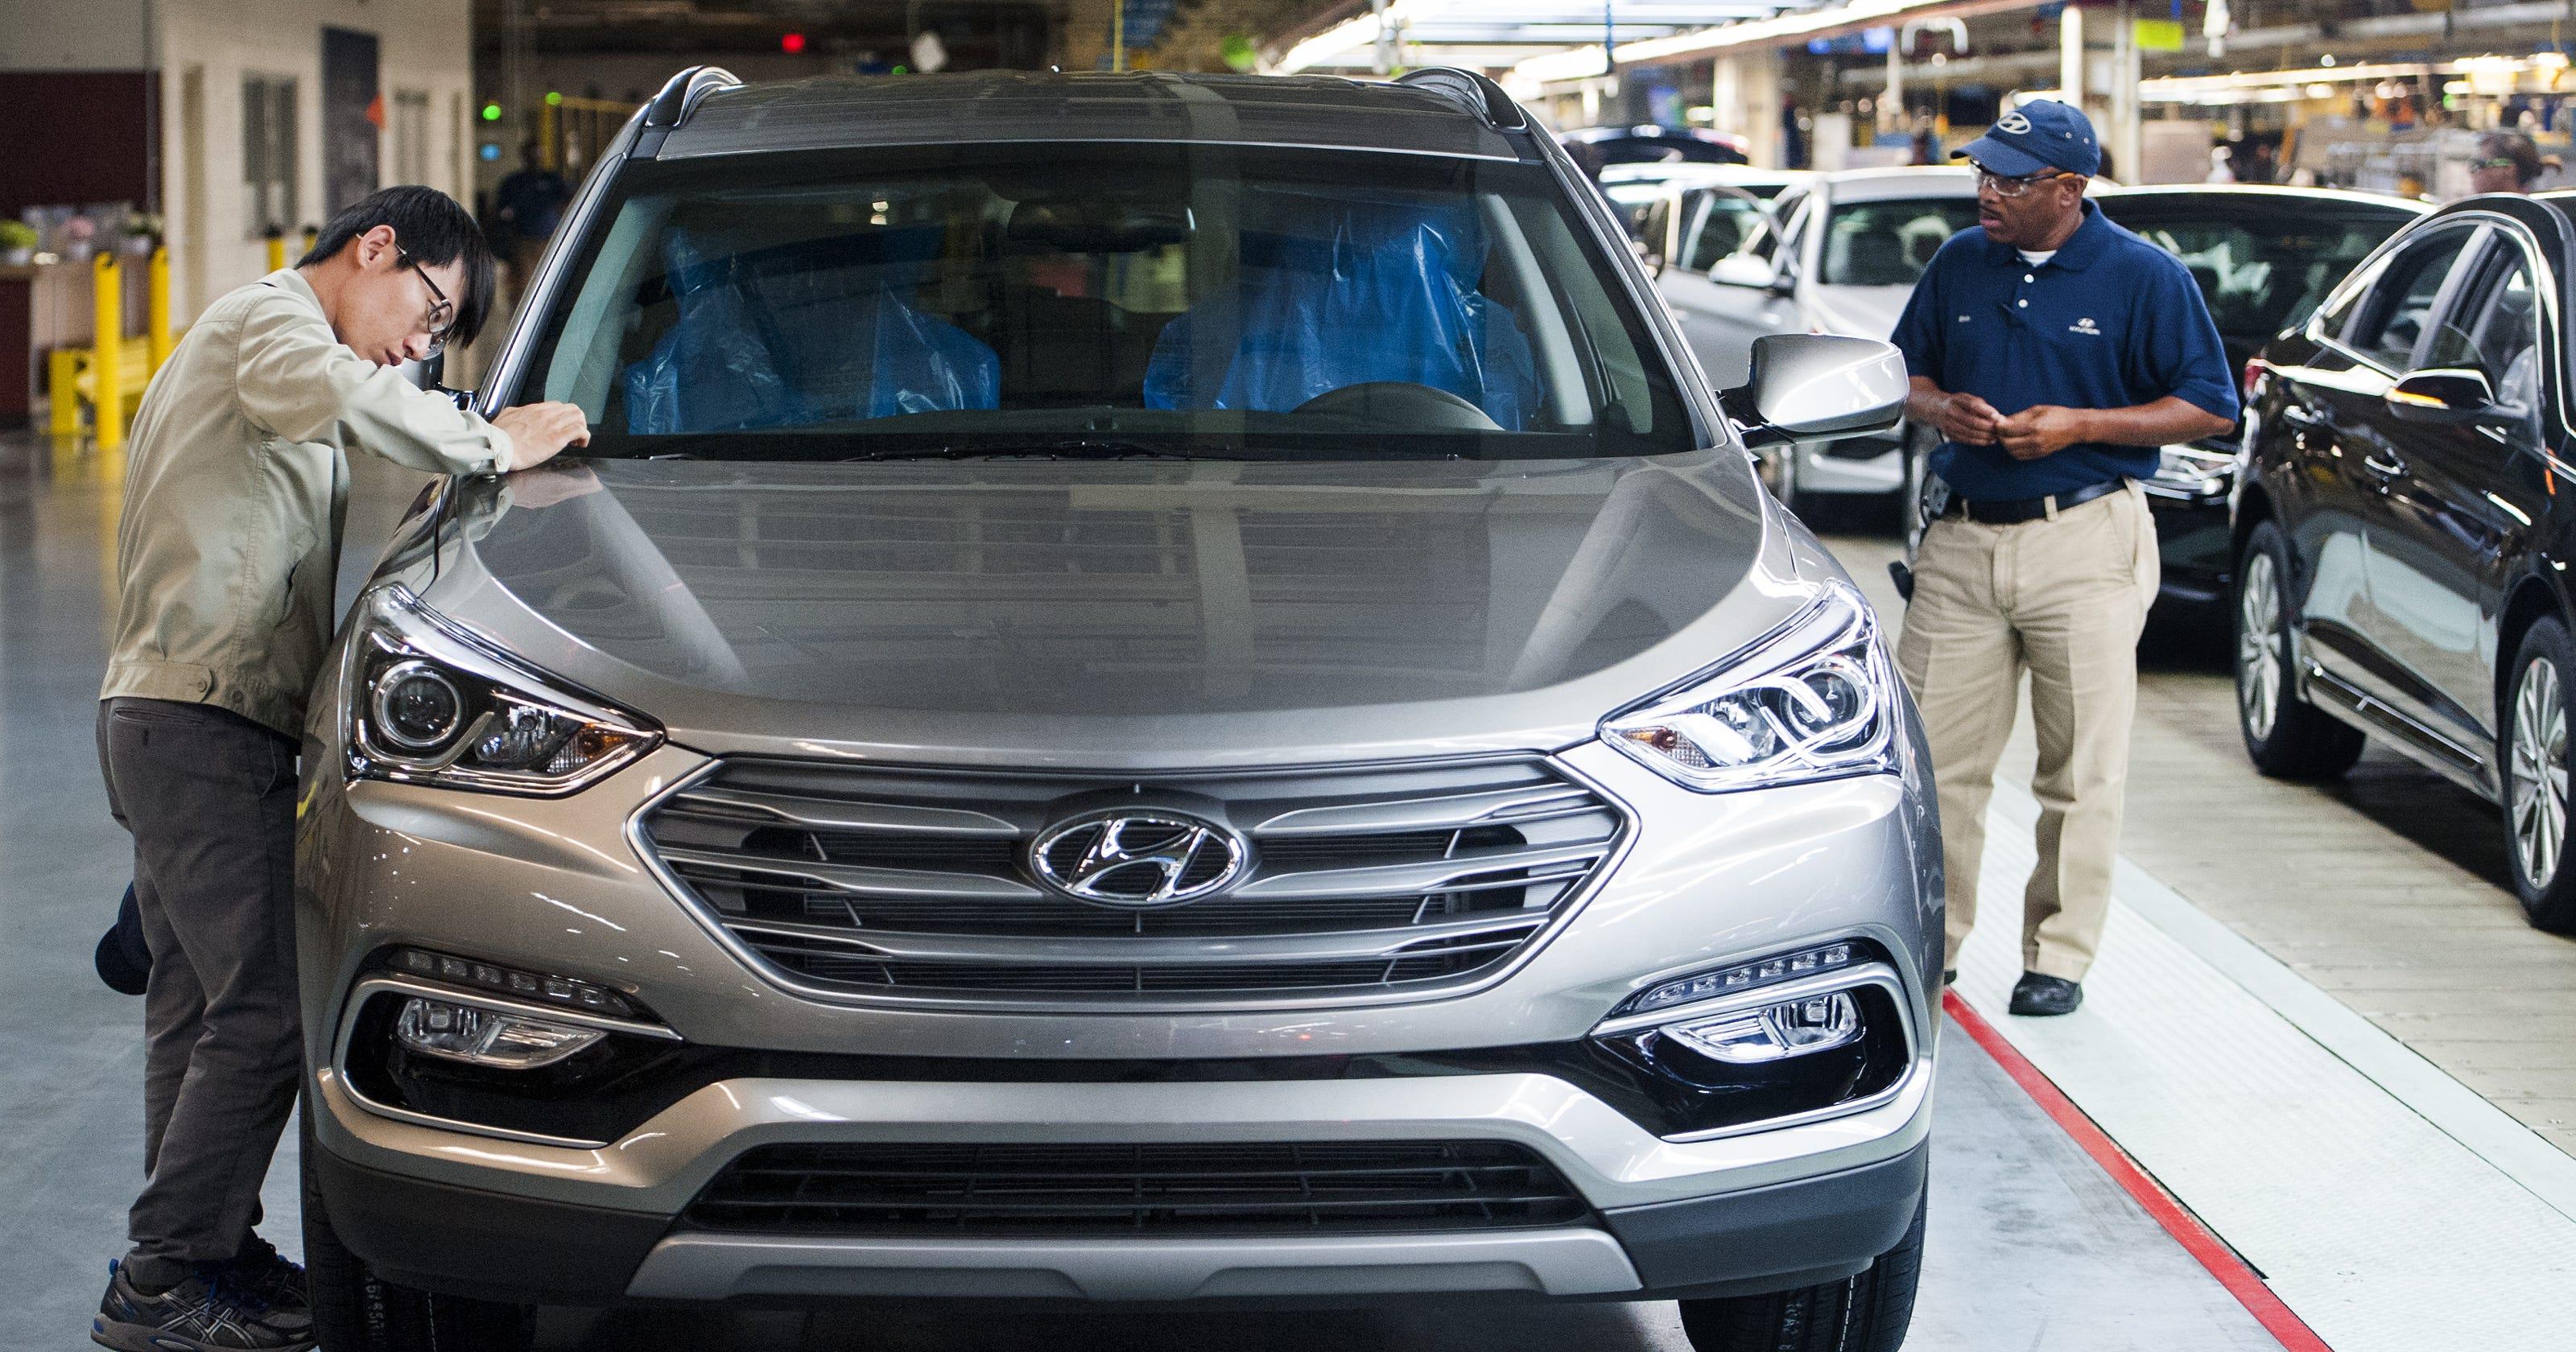 Bill Hood Hyundai >> Hyundai recalls 600K vehicles to fix hood latches, warning ...